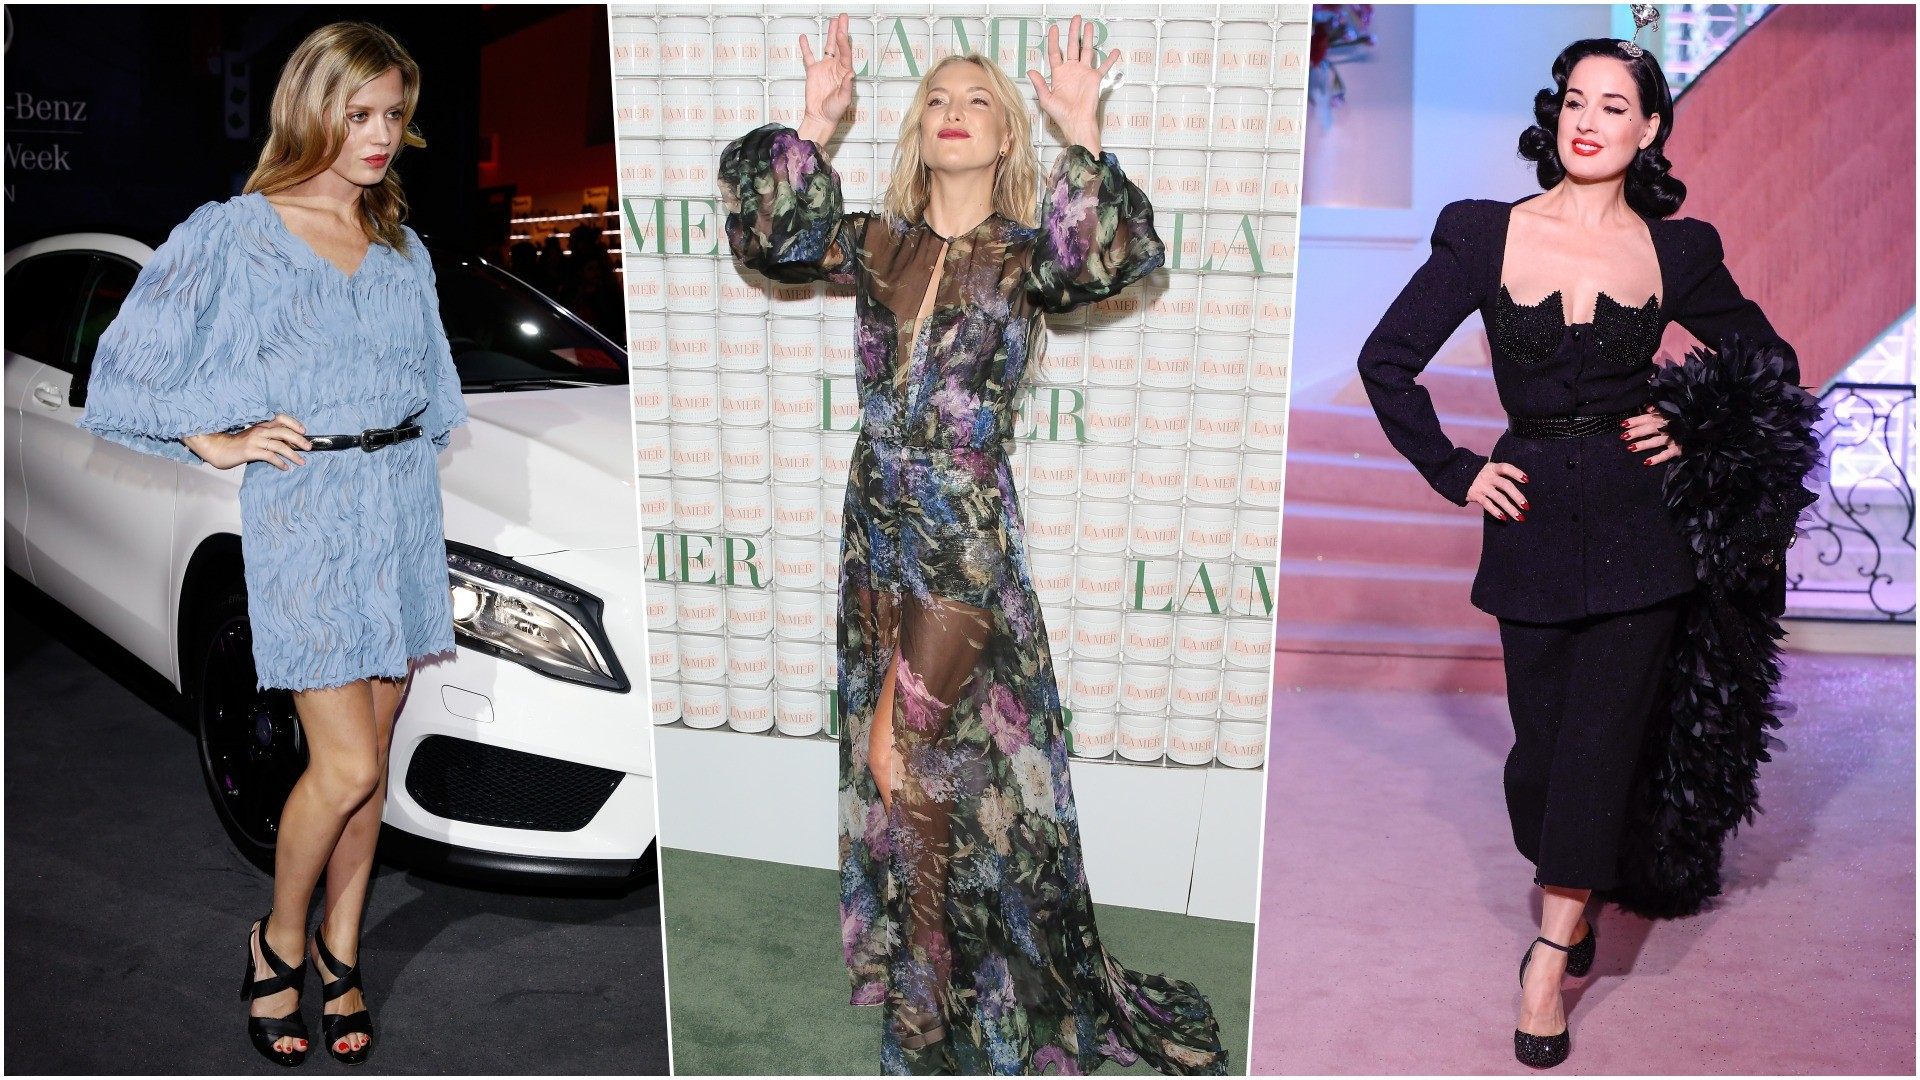 Georgia May Jagger in the clothes of Alena Akhmadullina, Dita von Teese in Sergeenko, Kate Hudson in Yanina